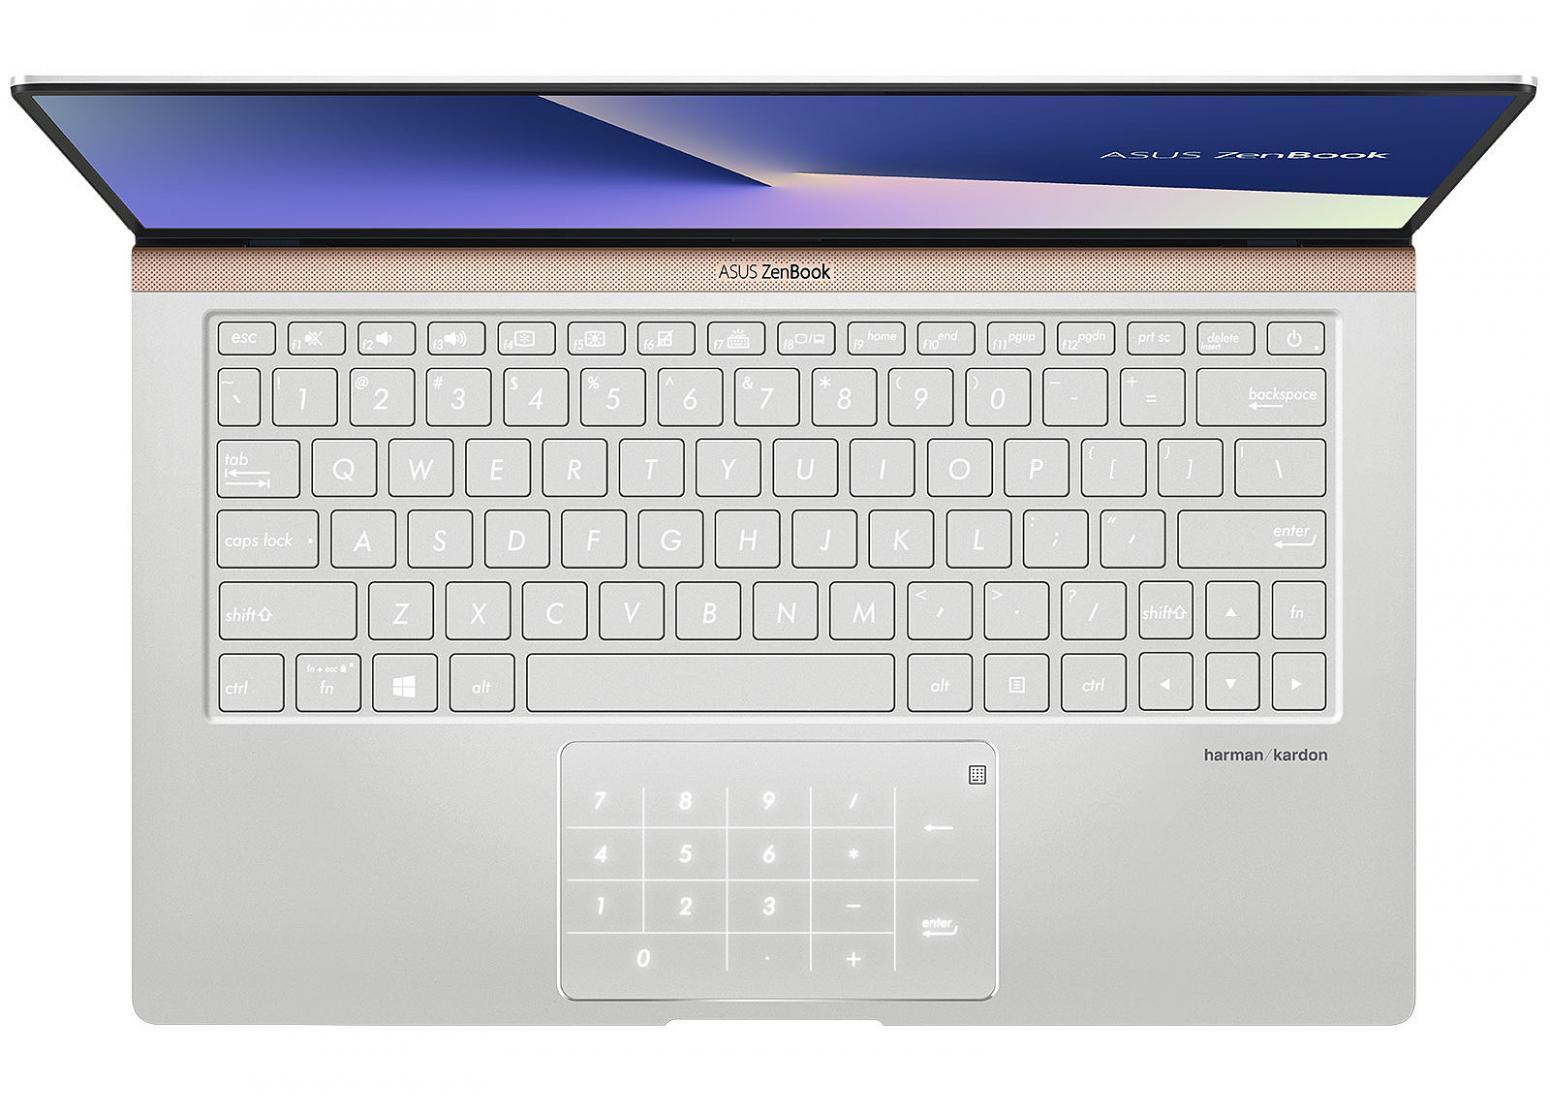 Ordinateur portable Asus Zenbook 13 UX333FA-A3132R Argent - NumPad, Pro - photo 3